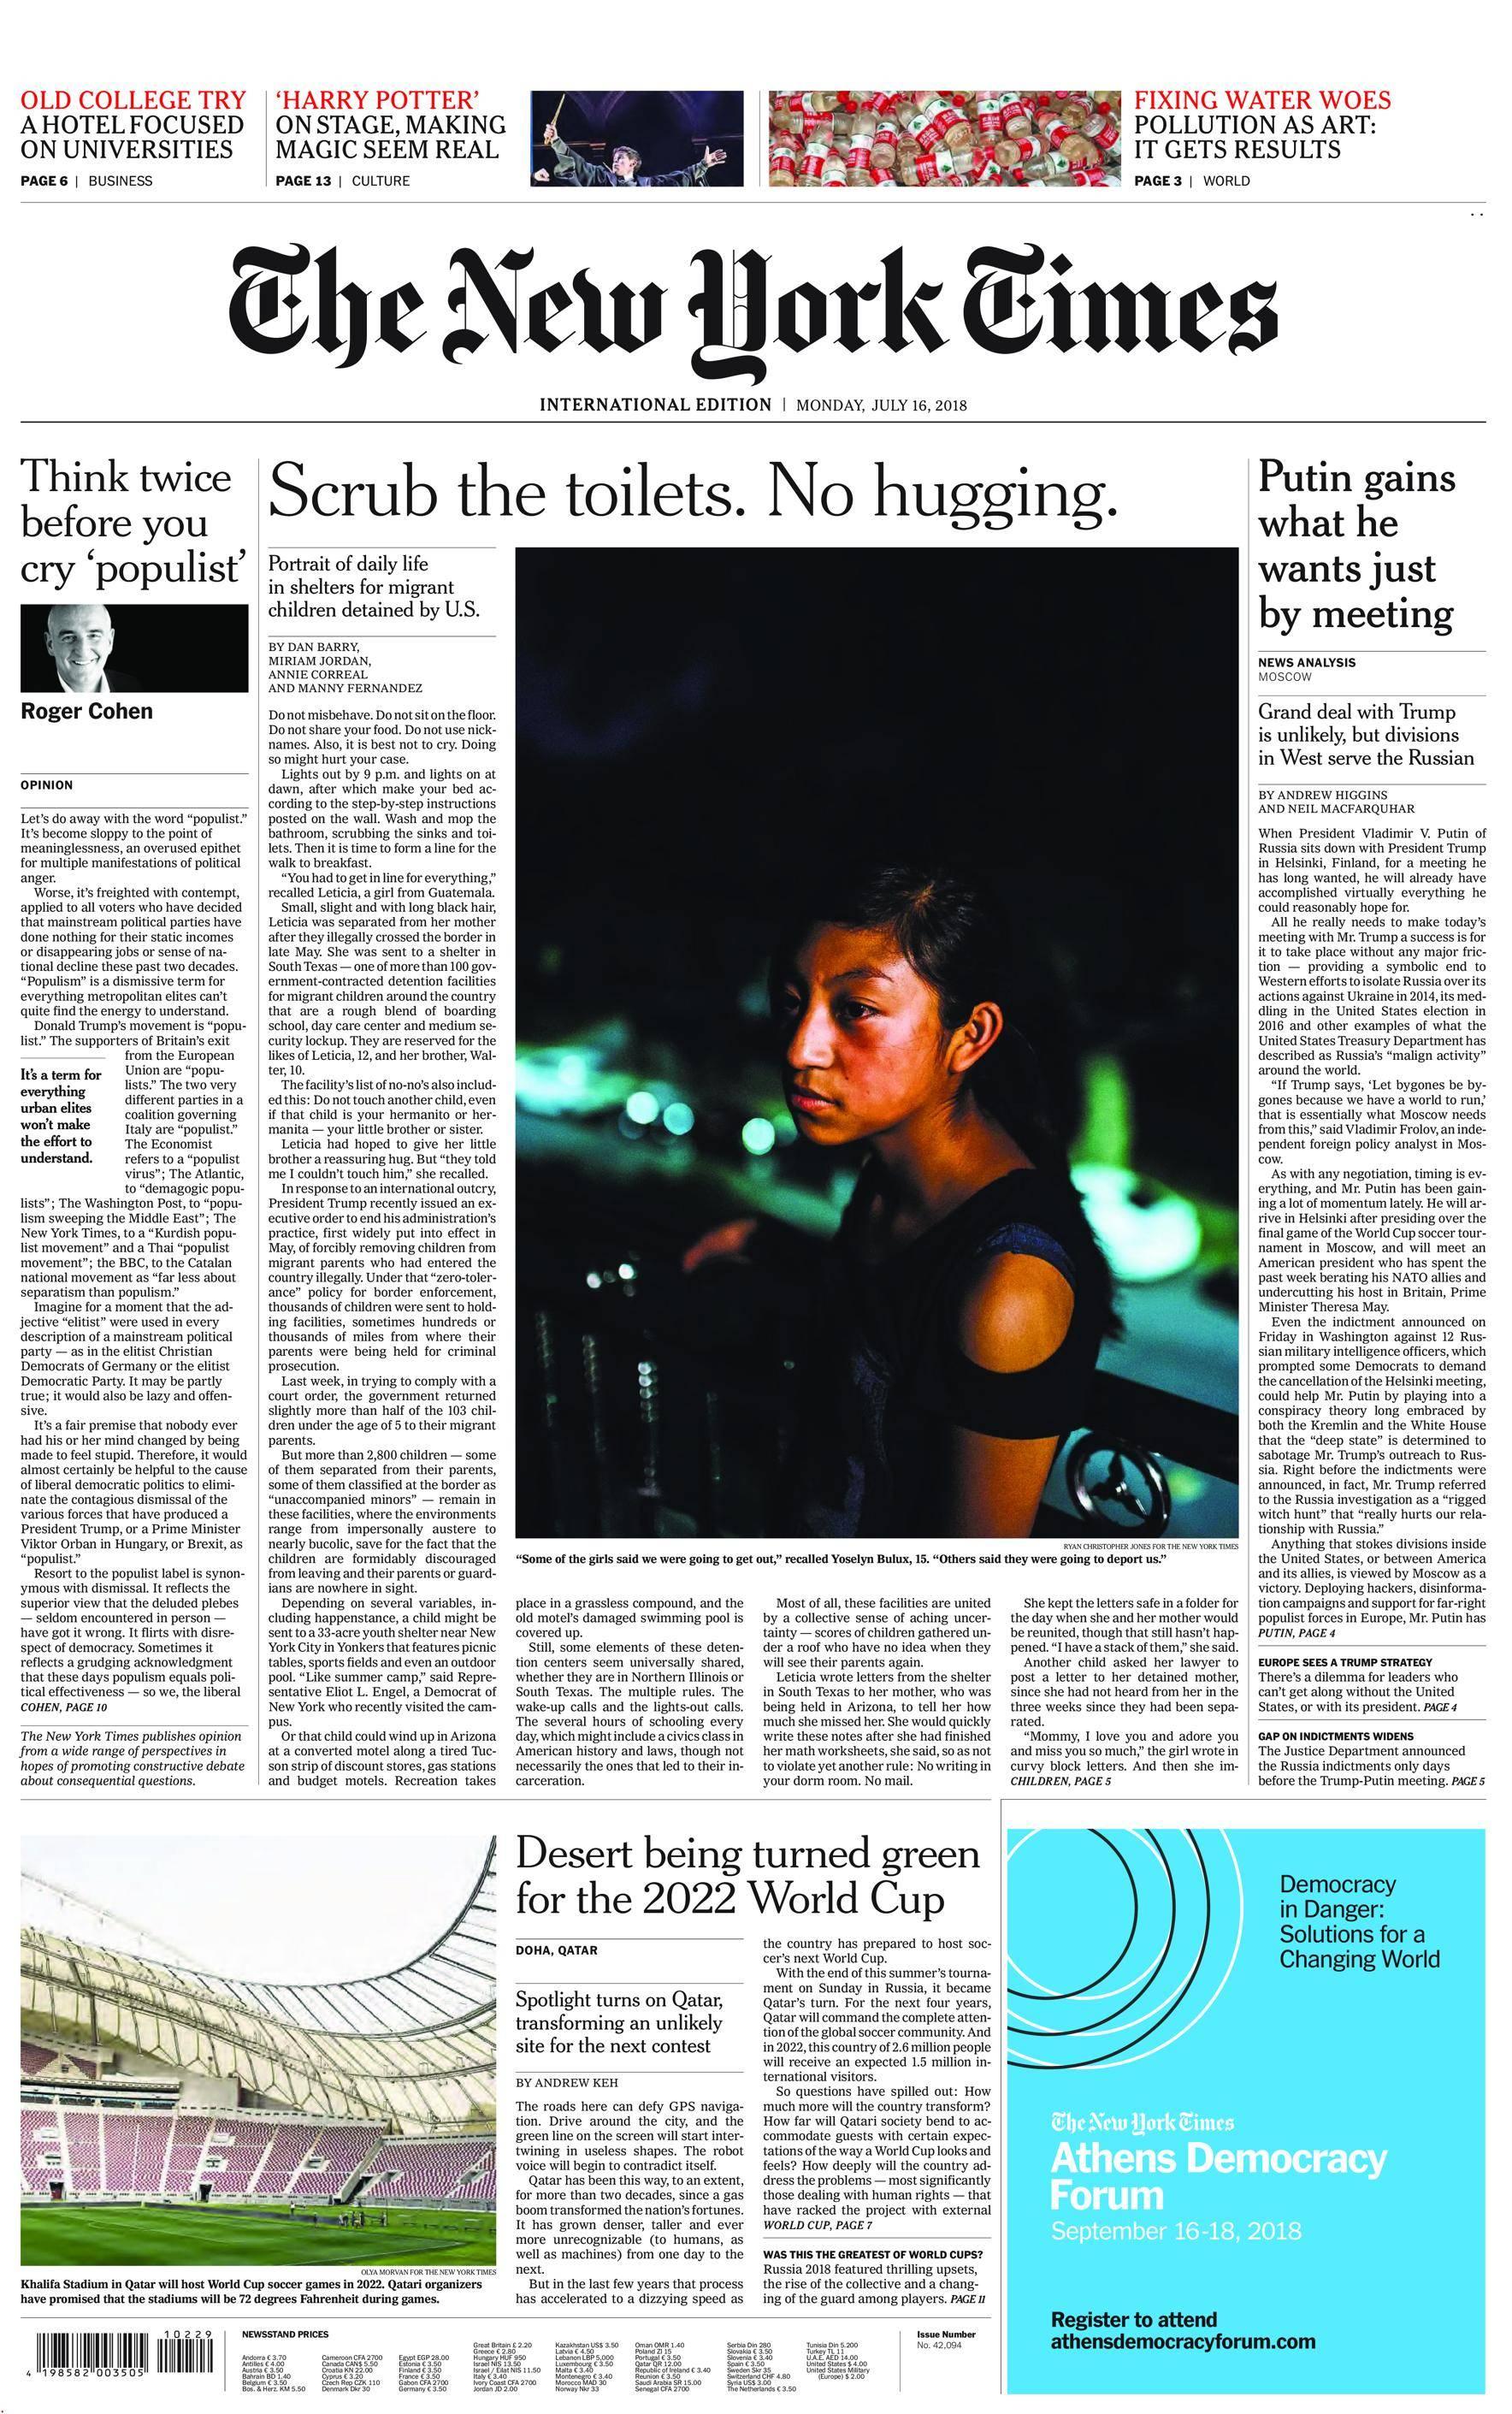 International New York Times - 16 July 2018